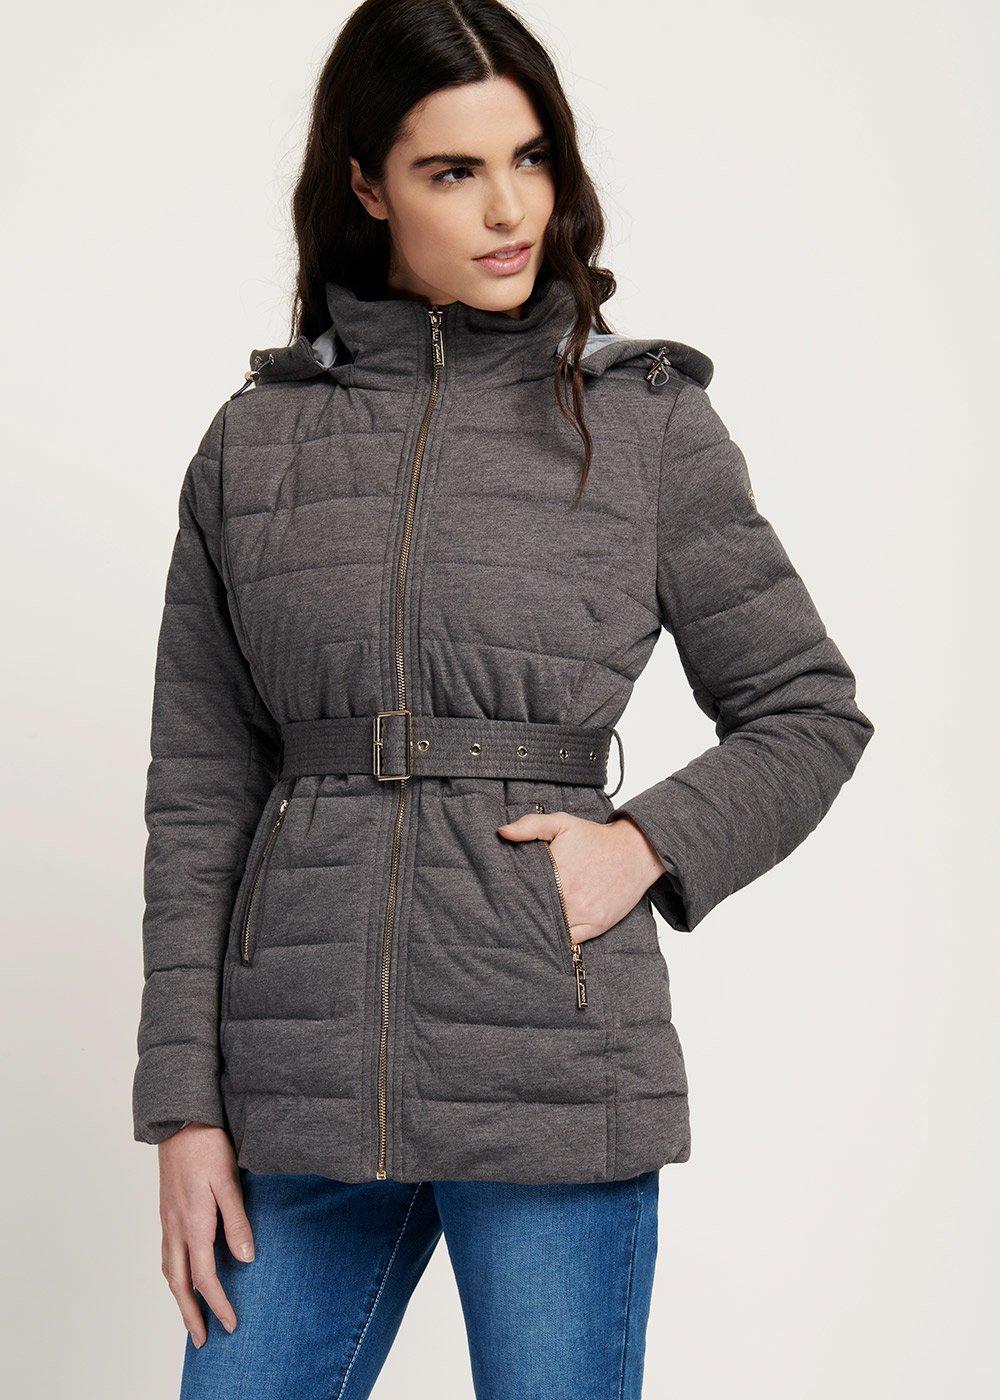 Parker jersey down jacket with melange effect - Medium Grey - Woman